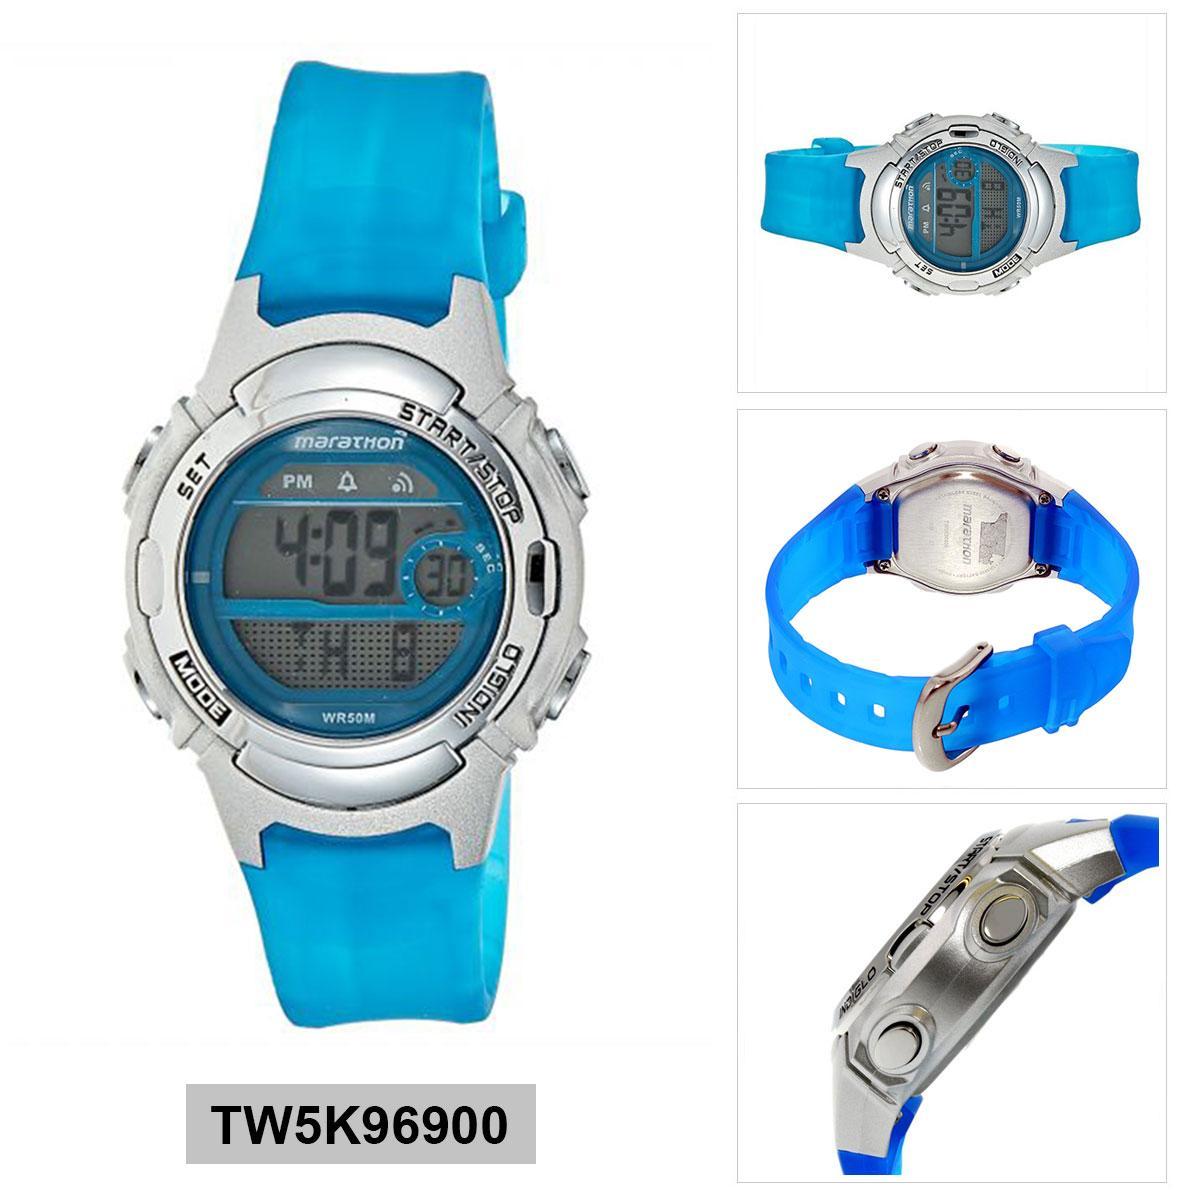 51aa61e6d Timex Marathon Blue Resin Case Resin Strap Ladies TW5K96900